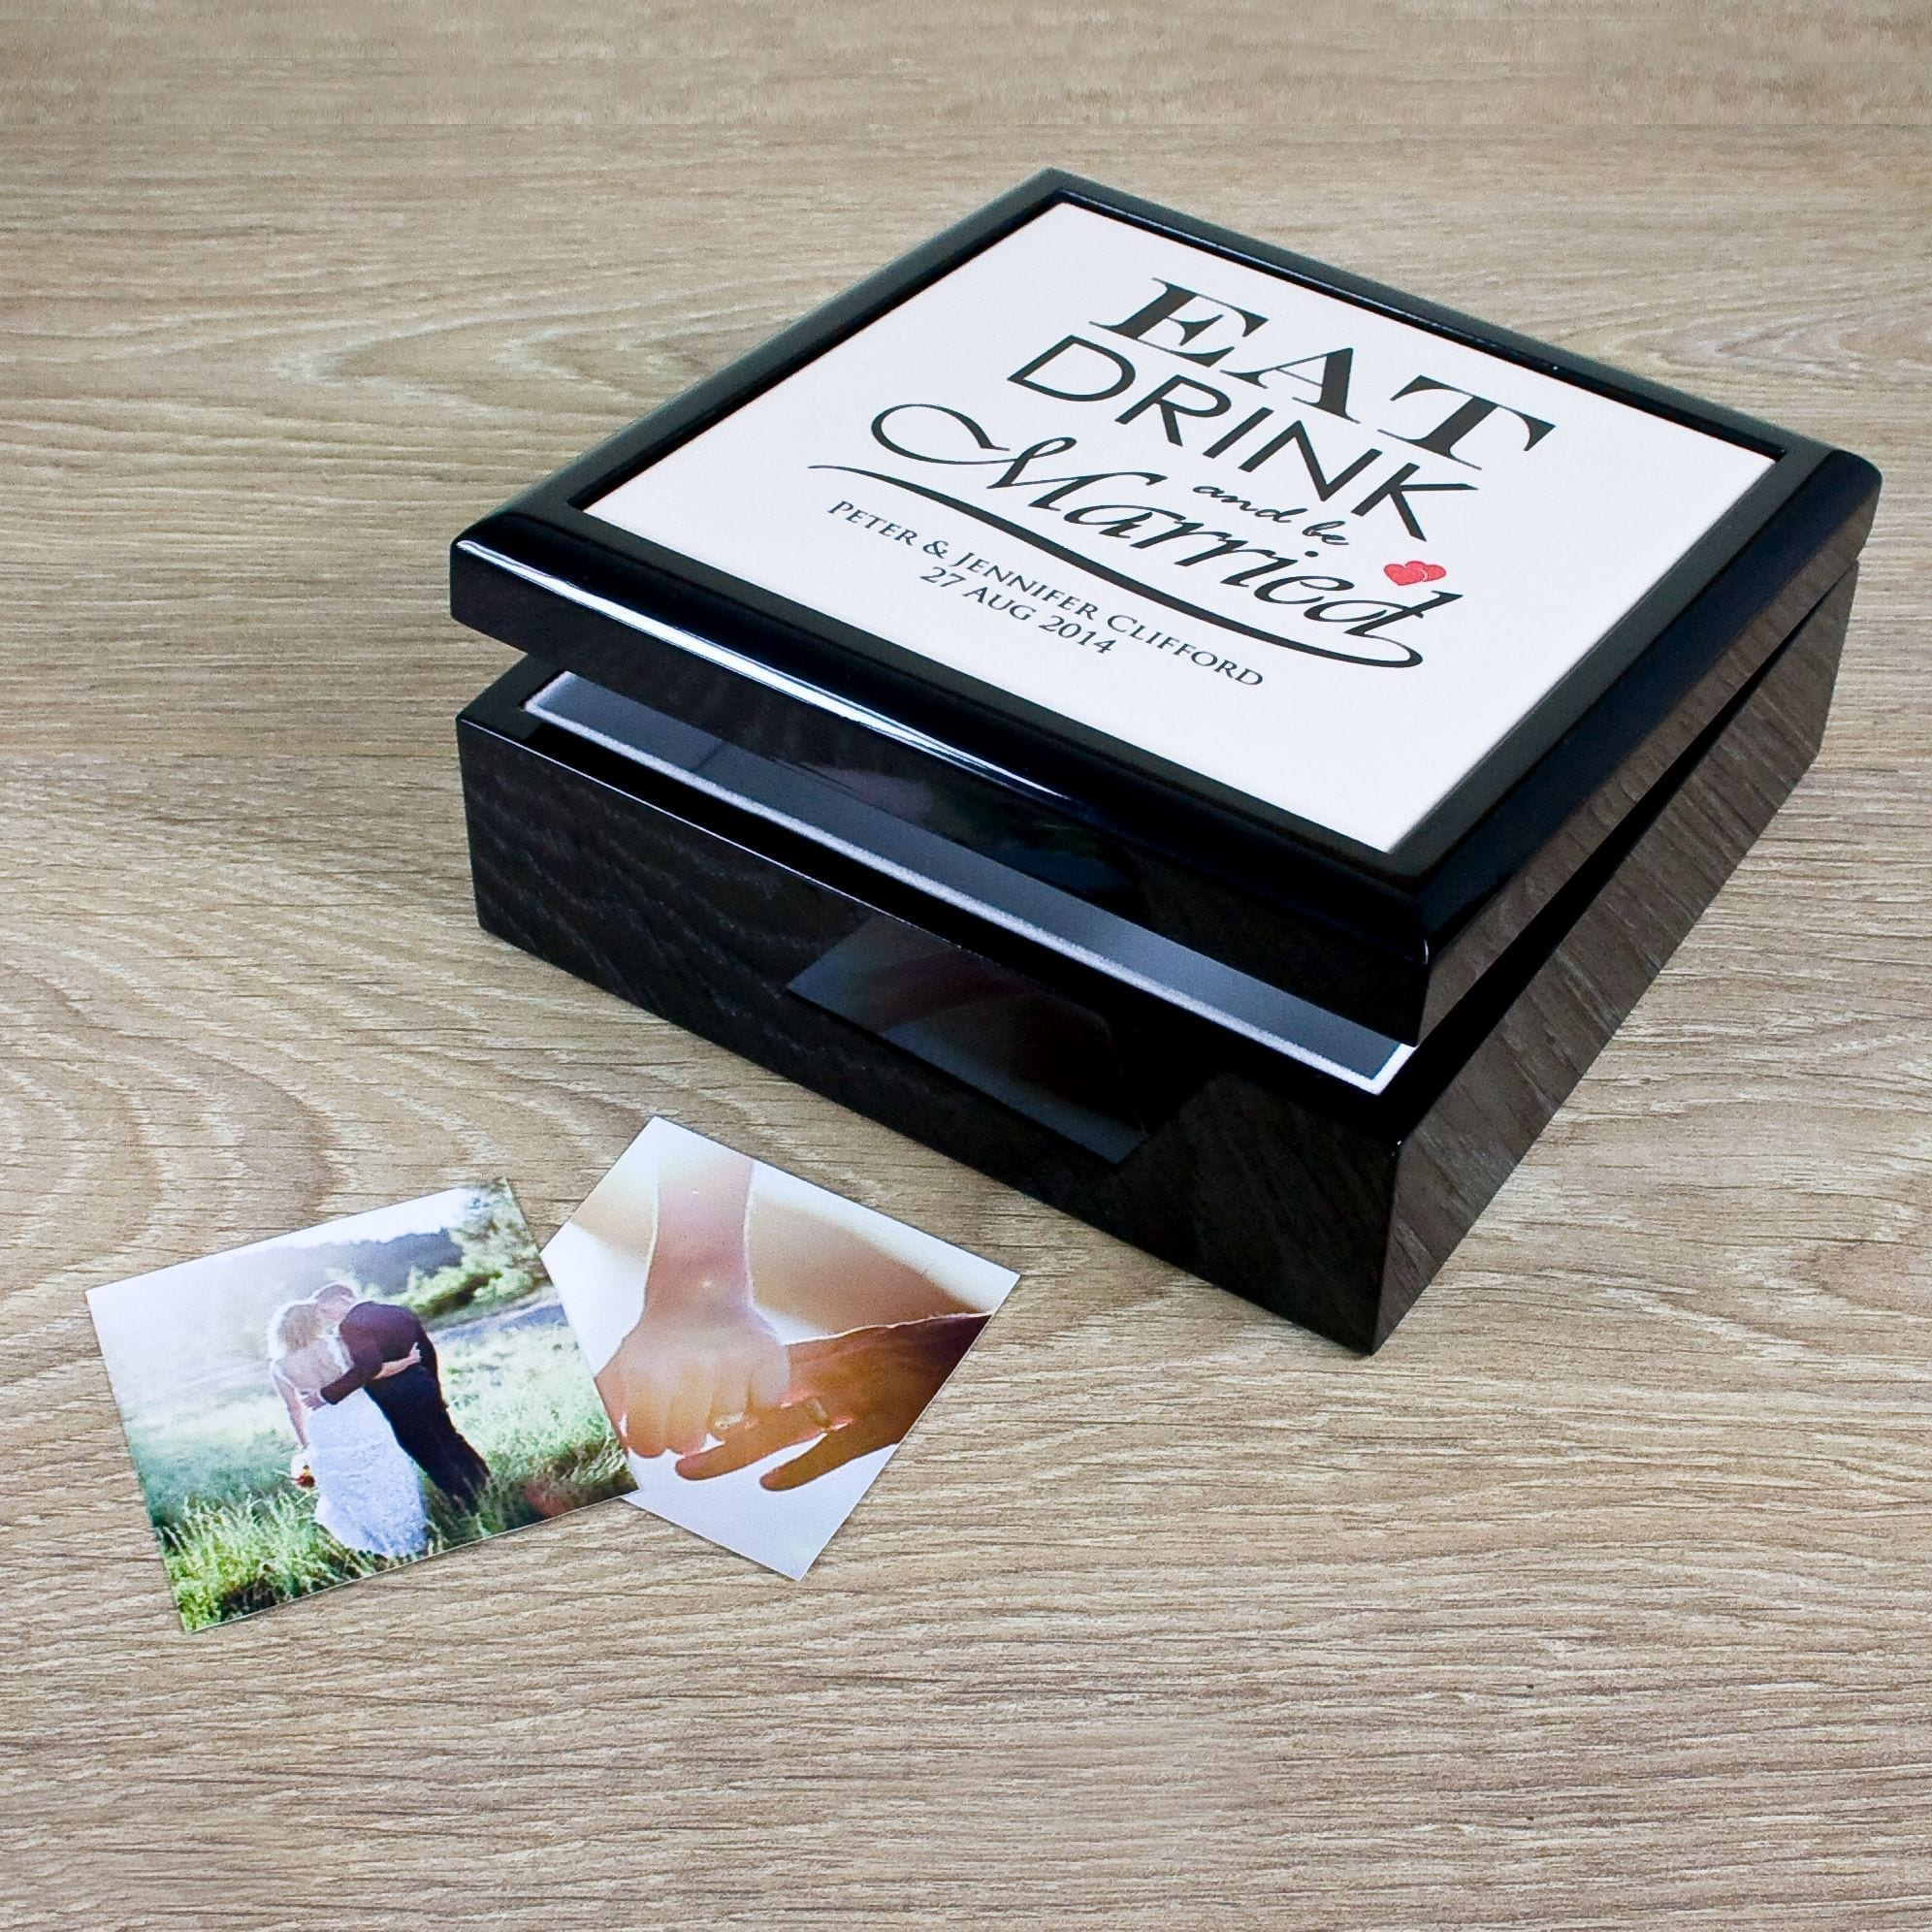 eat-drink-and-be-married-couple-keepsake-box-7818-p.jpg